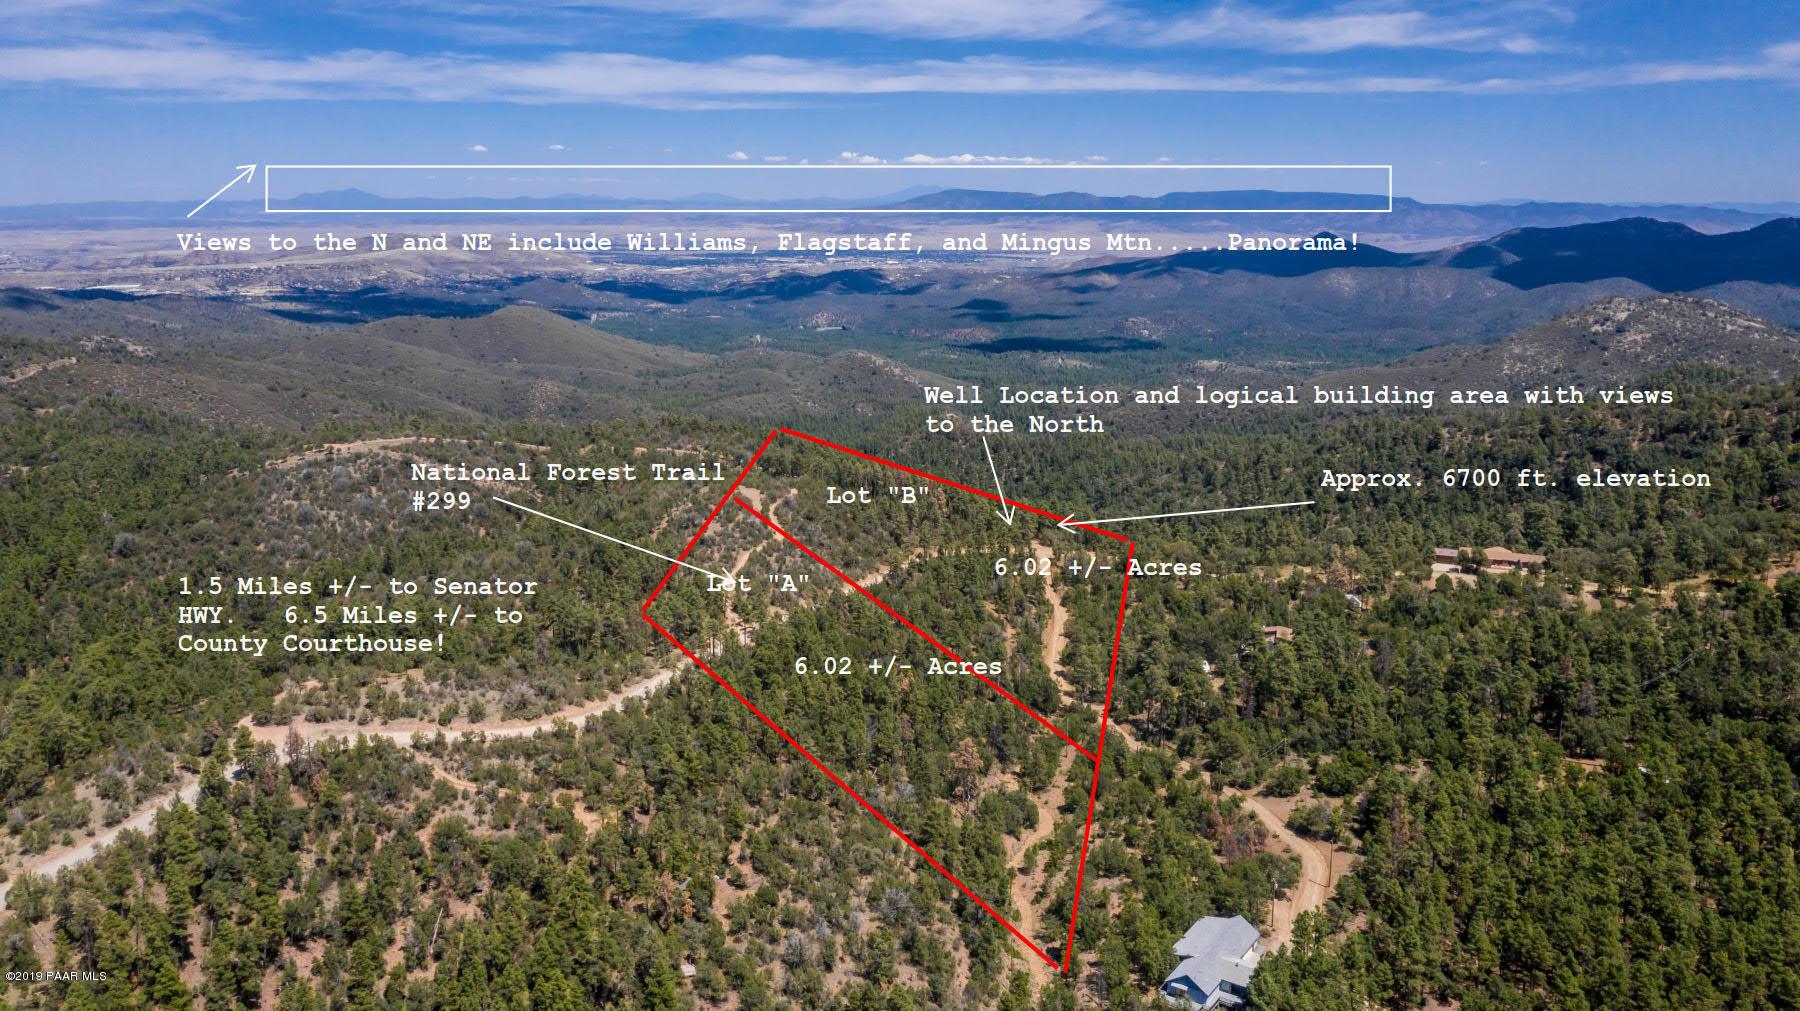 Photo of Spruce Mountain Lots Ab, Prescott, AZ 86303